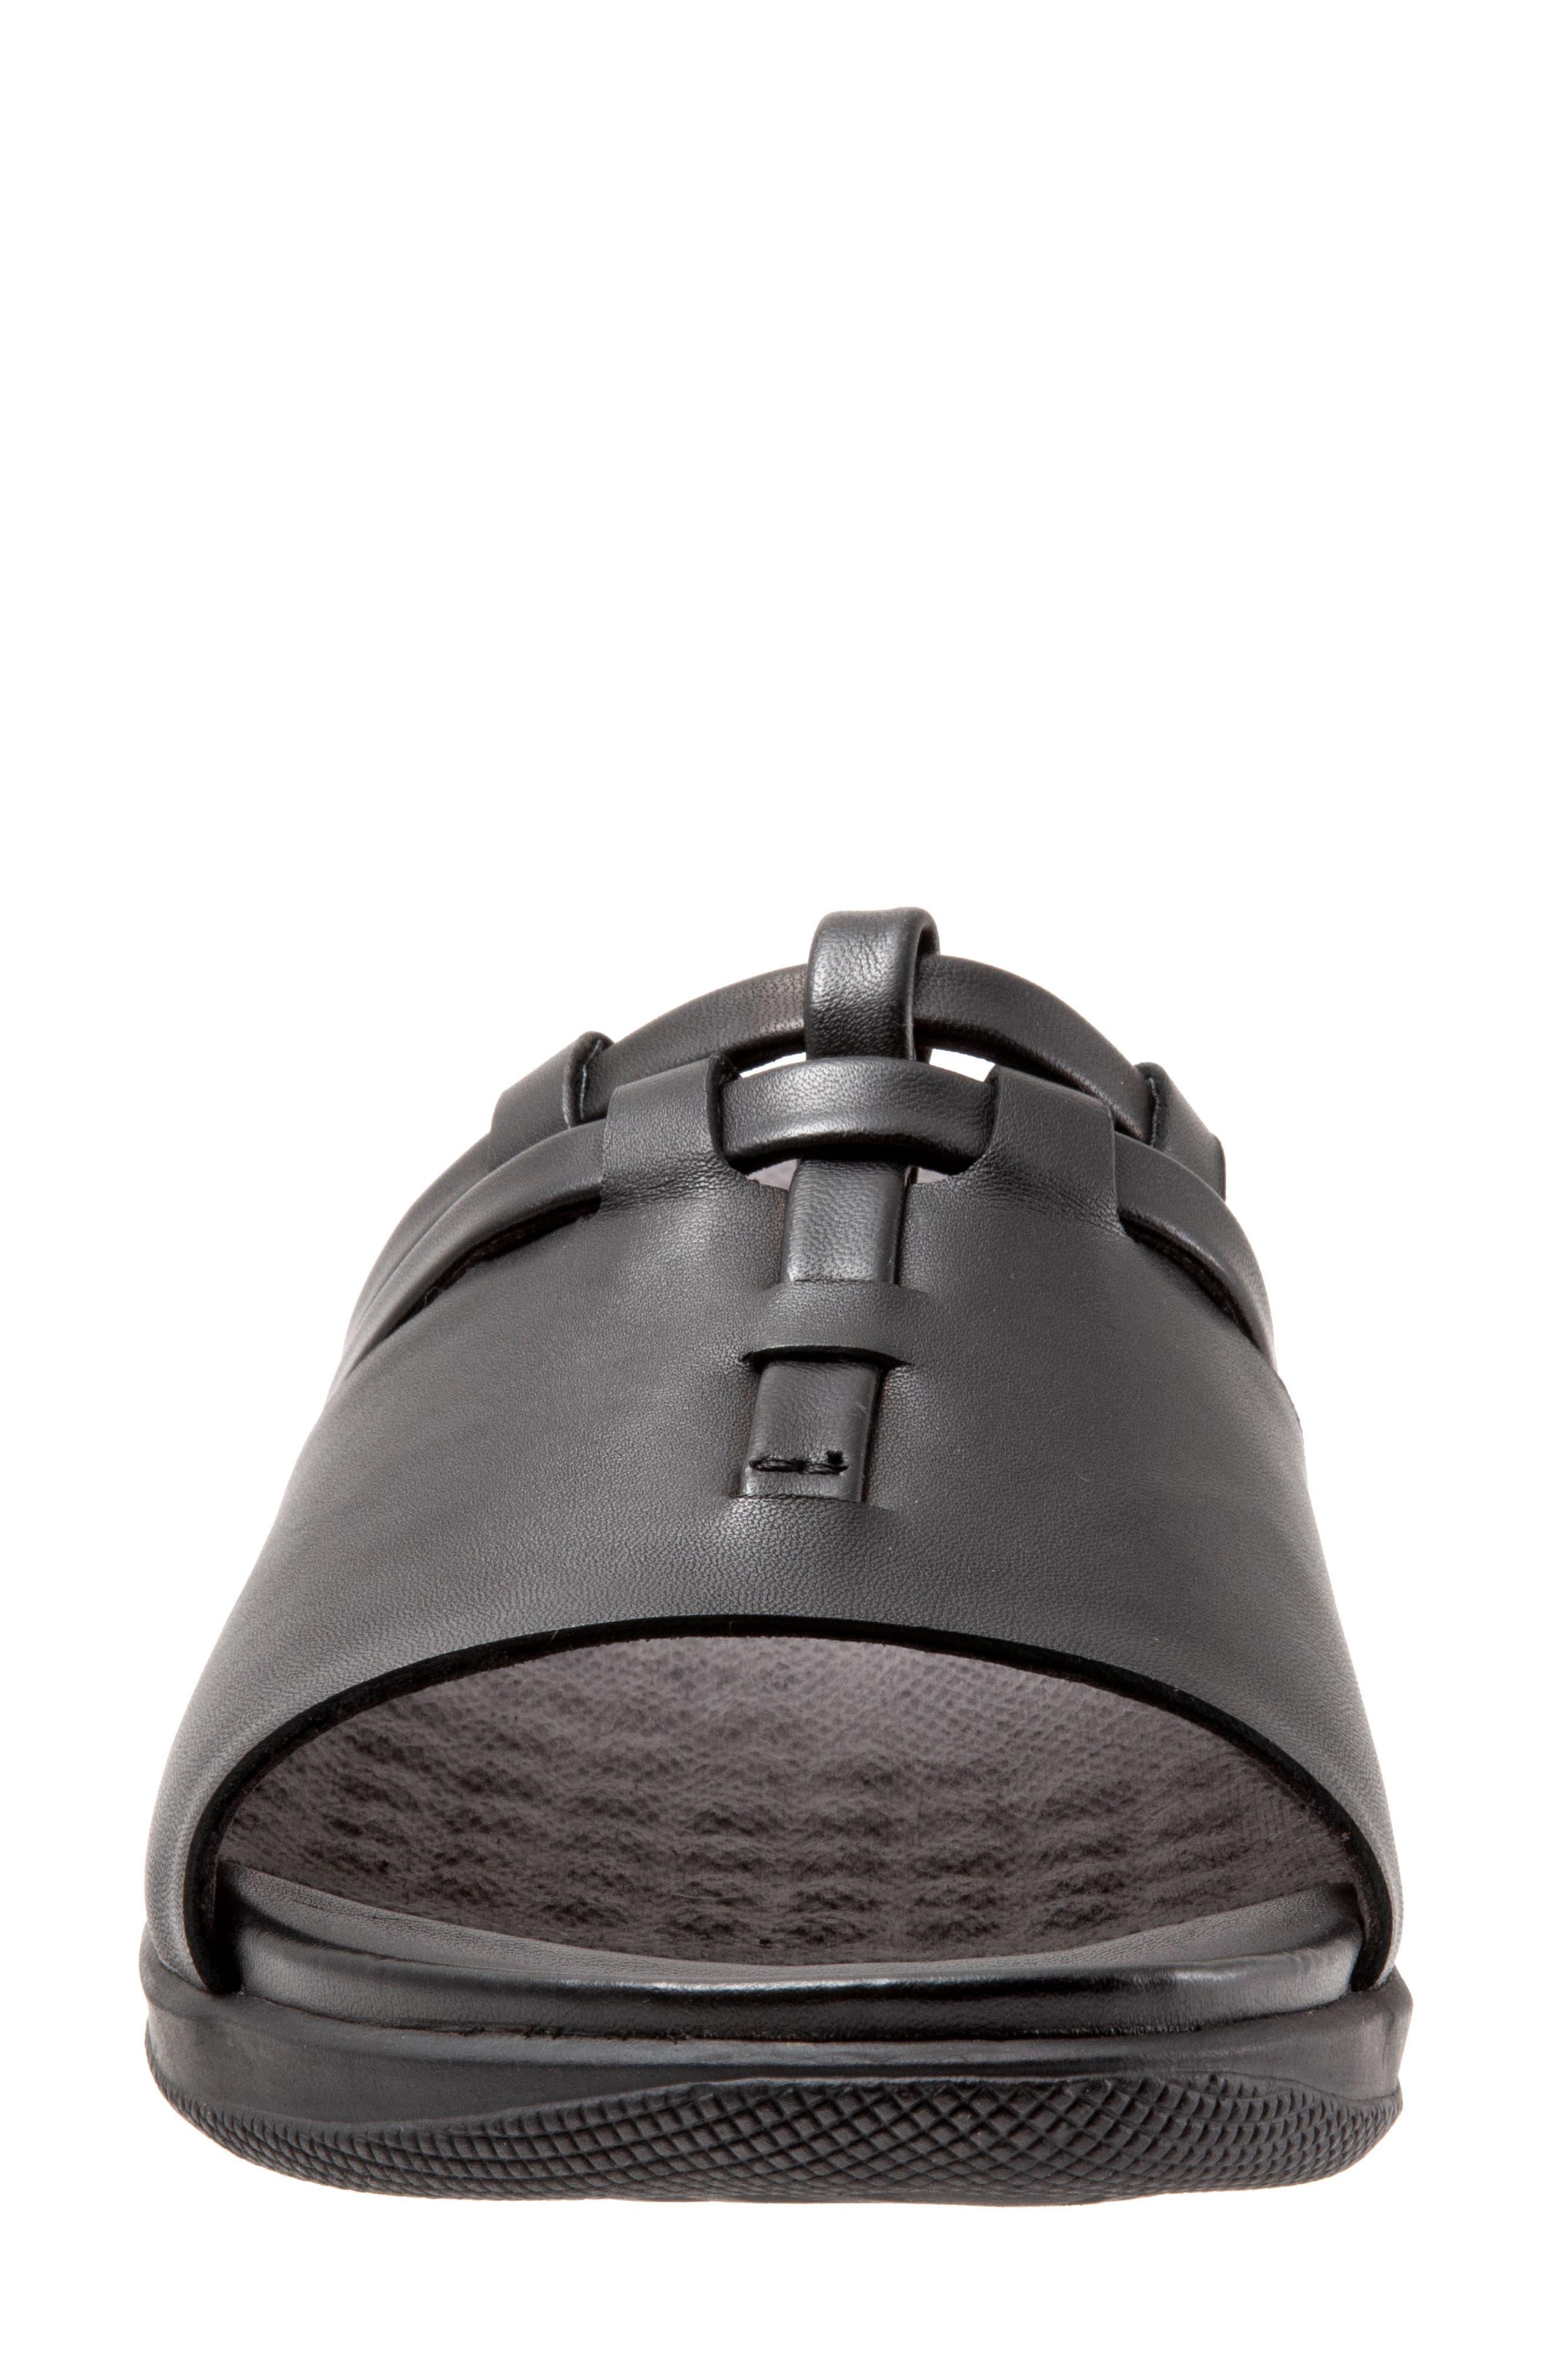 SOFTWALK<SUP>®</SUP>, Tahoma Woven Slide Sandal, Alternate thumbnail 4, color, BLACK LEATHER